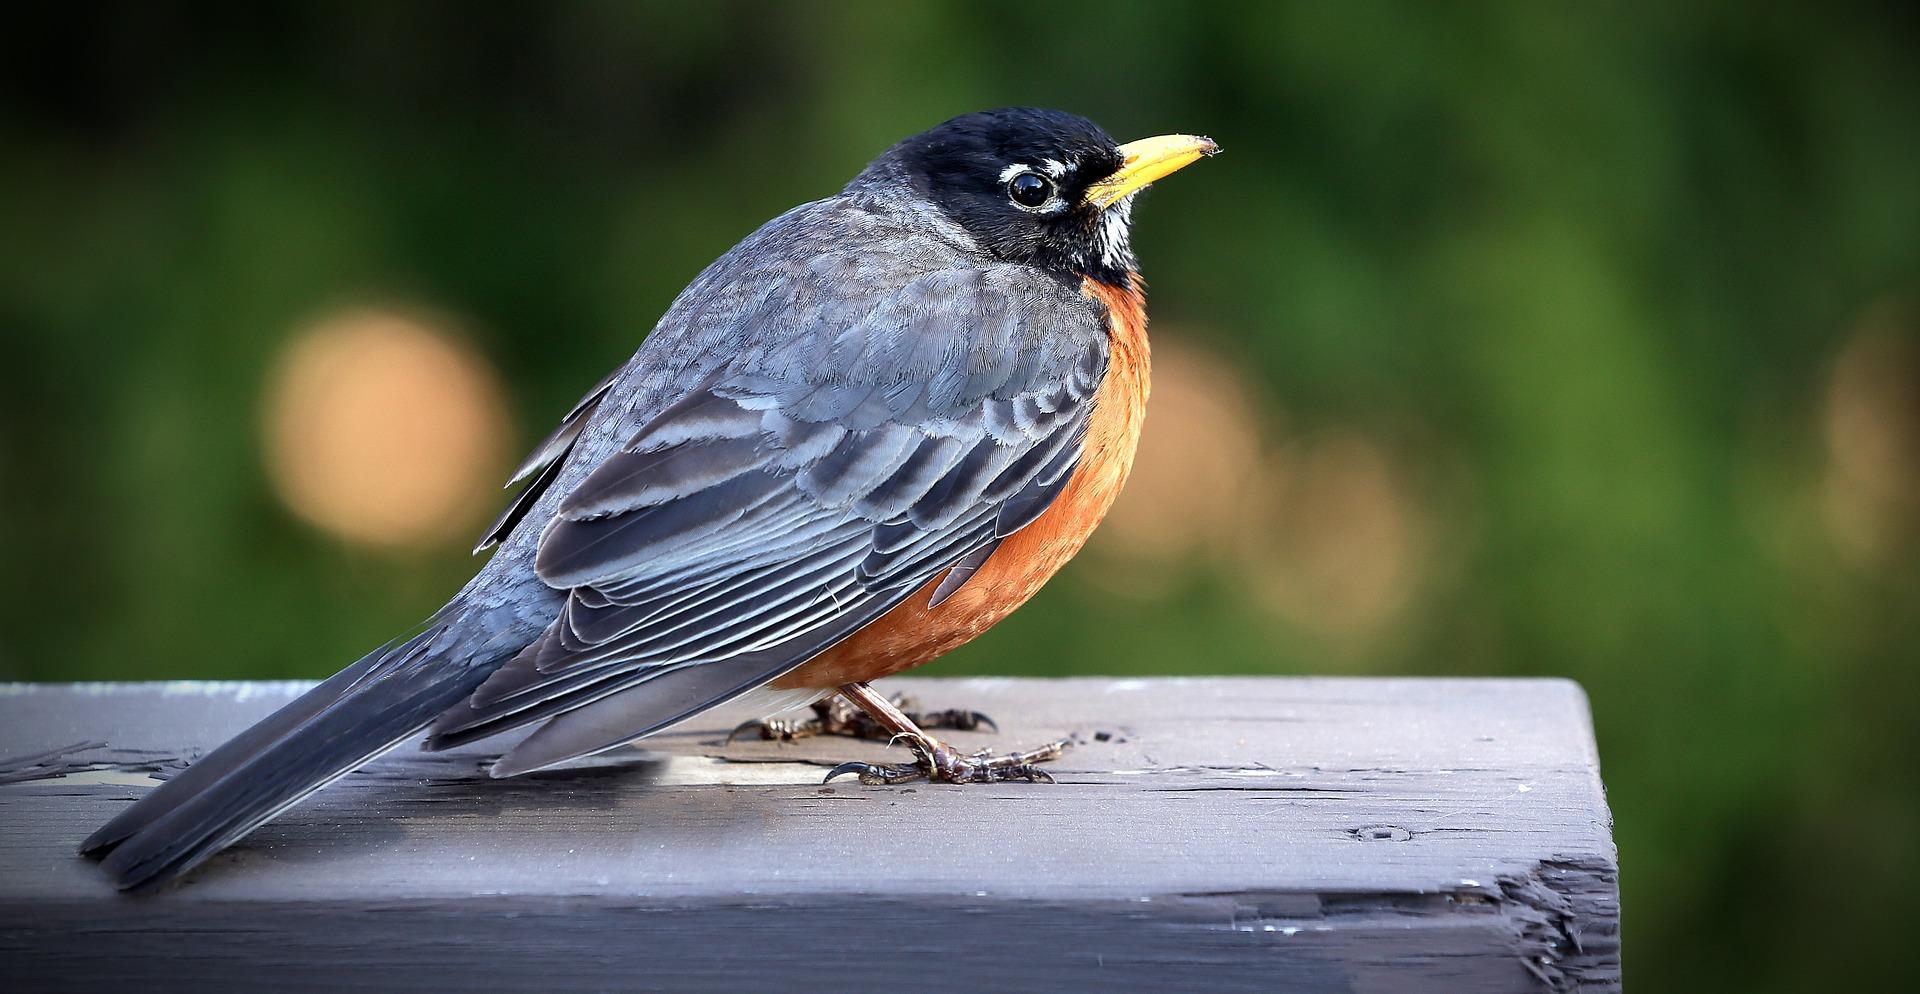 birds, science, animals